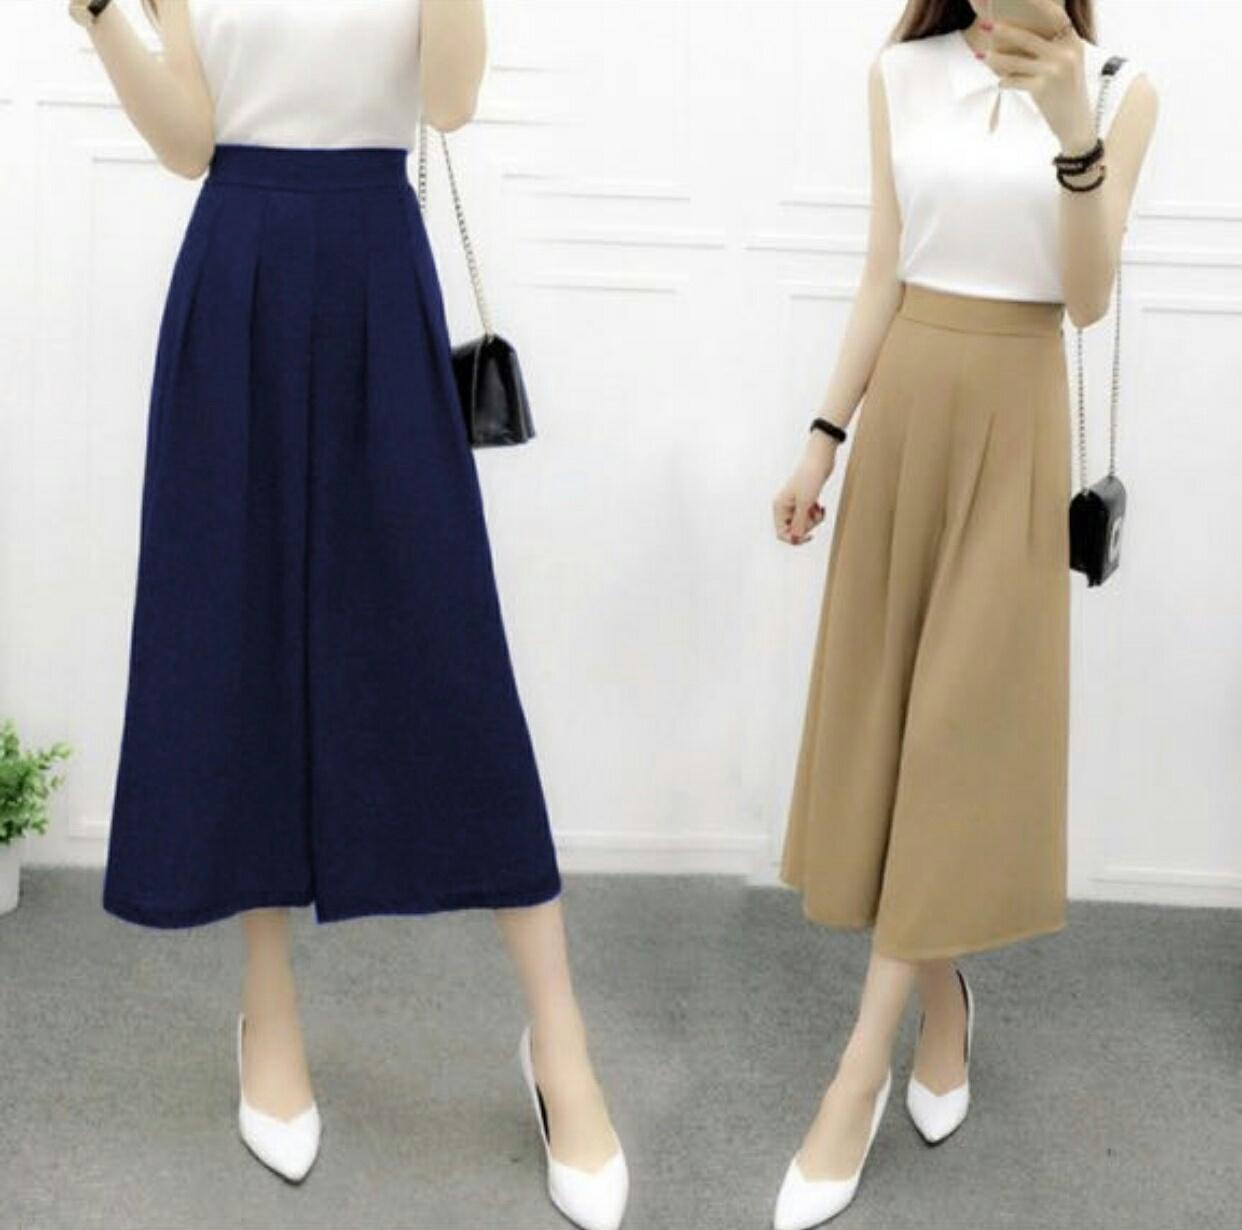 LEMONE Baju Kaos Wanita Asian Games Hitam 500SS602975. Source · Media Fashion Shop – Celana Wanita Asia – Celana Korea – Celana Wanita – PANT KIREI